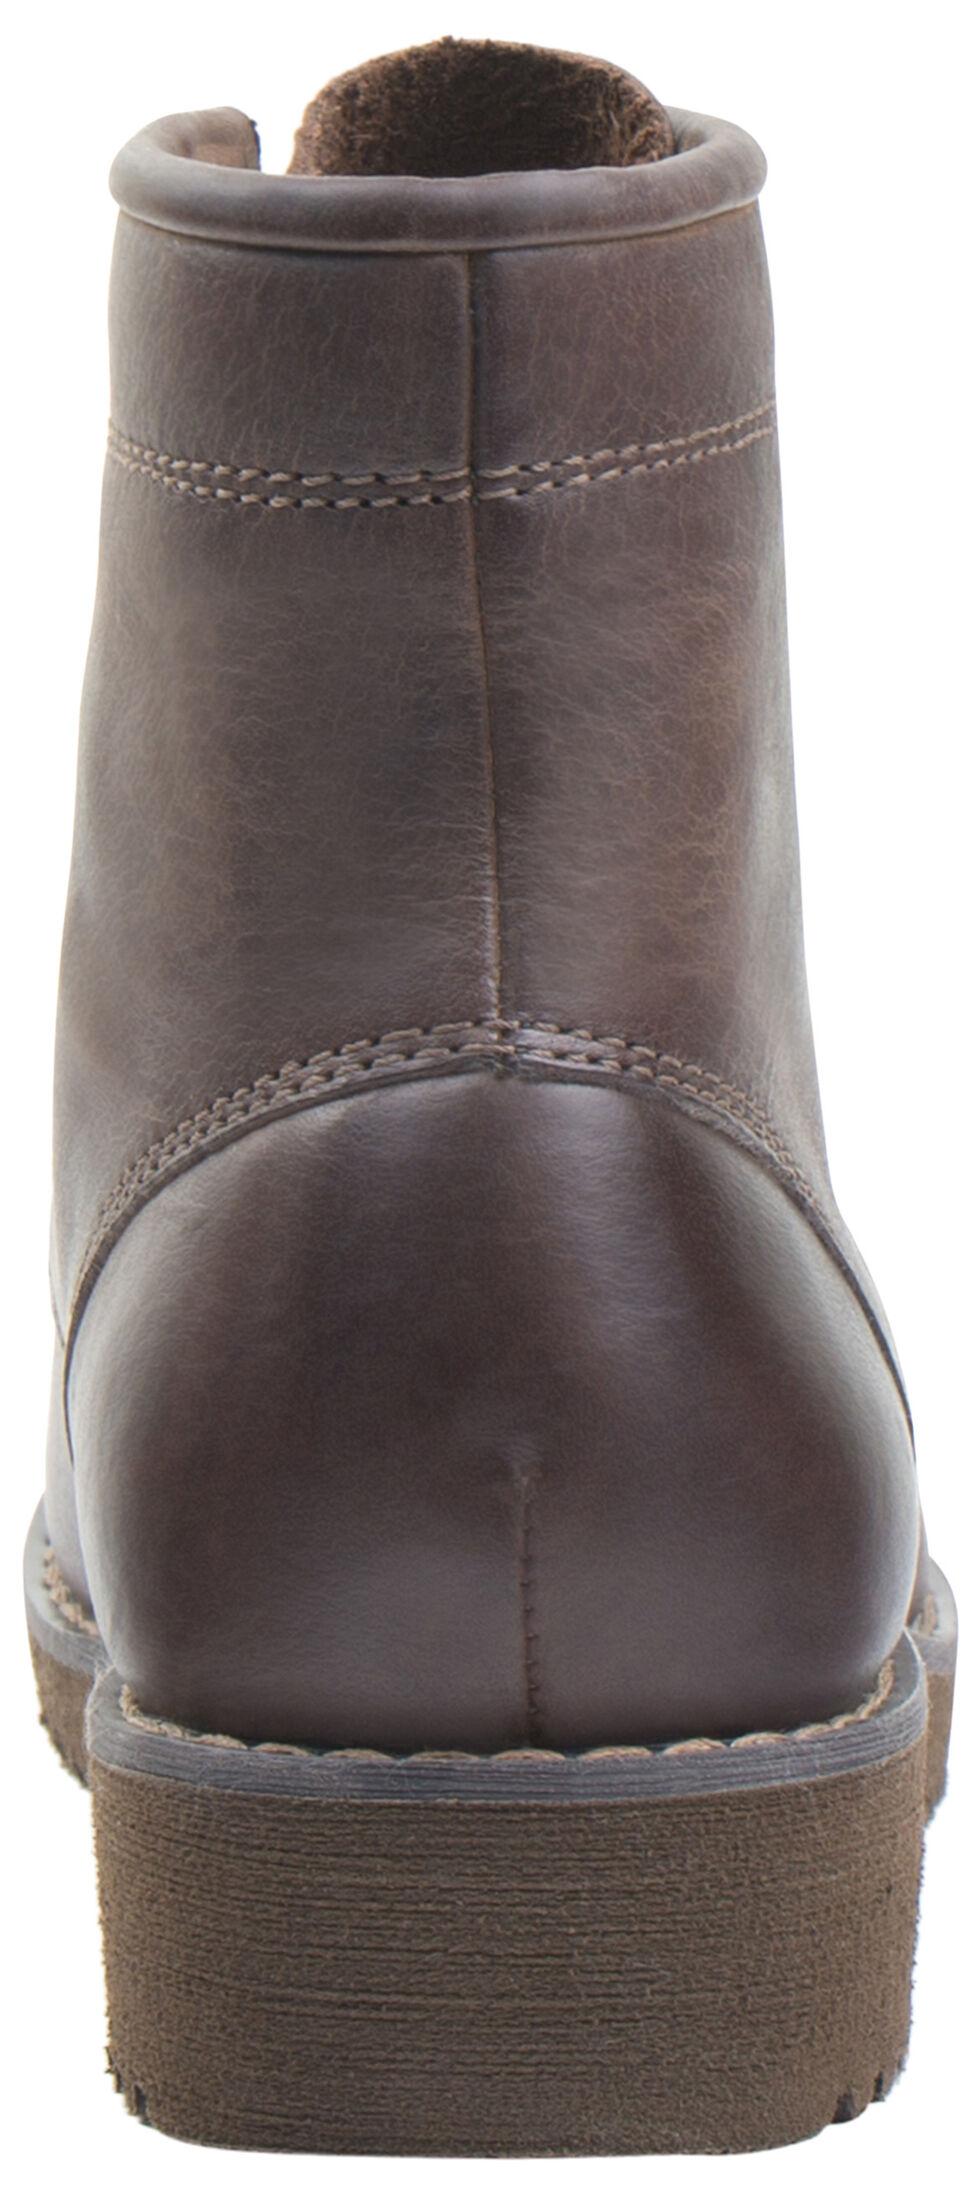 Eastland Women's Dark Tan Dakota Lace-Up Boots, Tan, hi-res